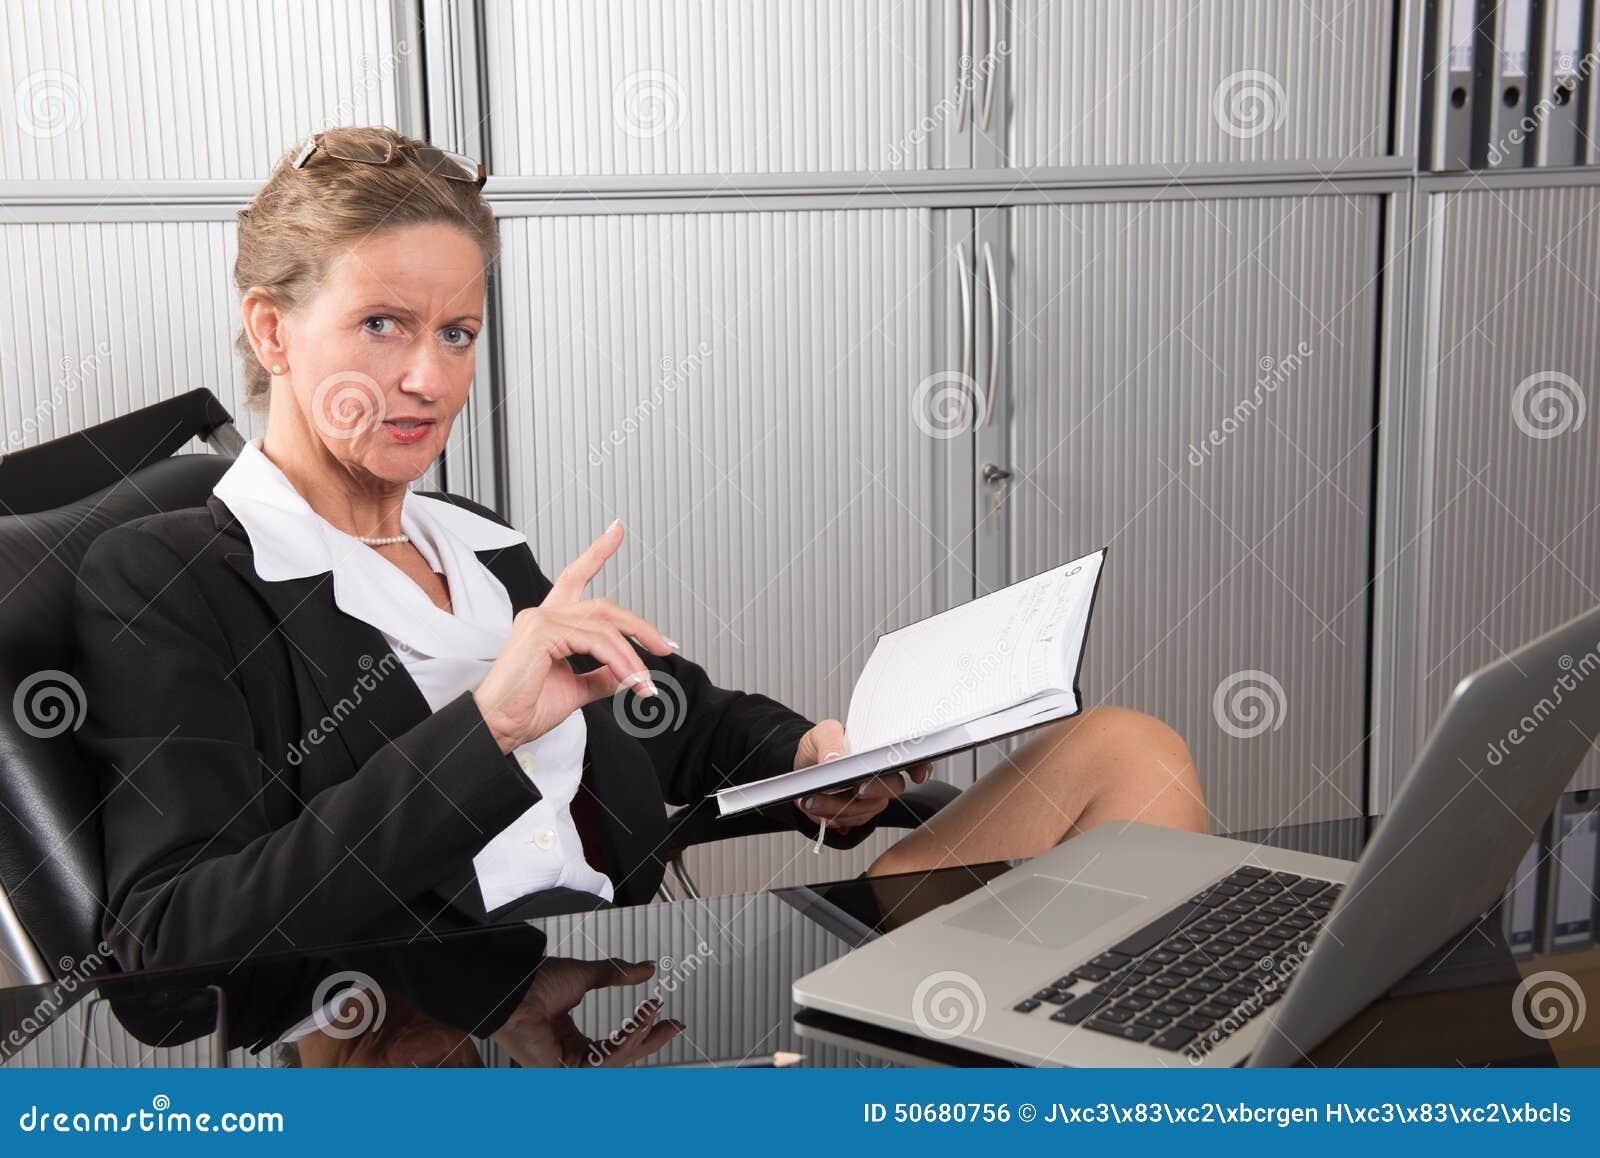 Download 女性厨师在谈论结果的办公室 库存照片. 图片 包括有 控制, 俄国猎狼犬, 有吸引力的, 日期, 眼睛, 协议 - 50680756